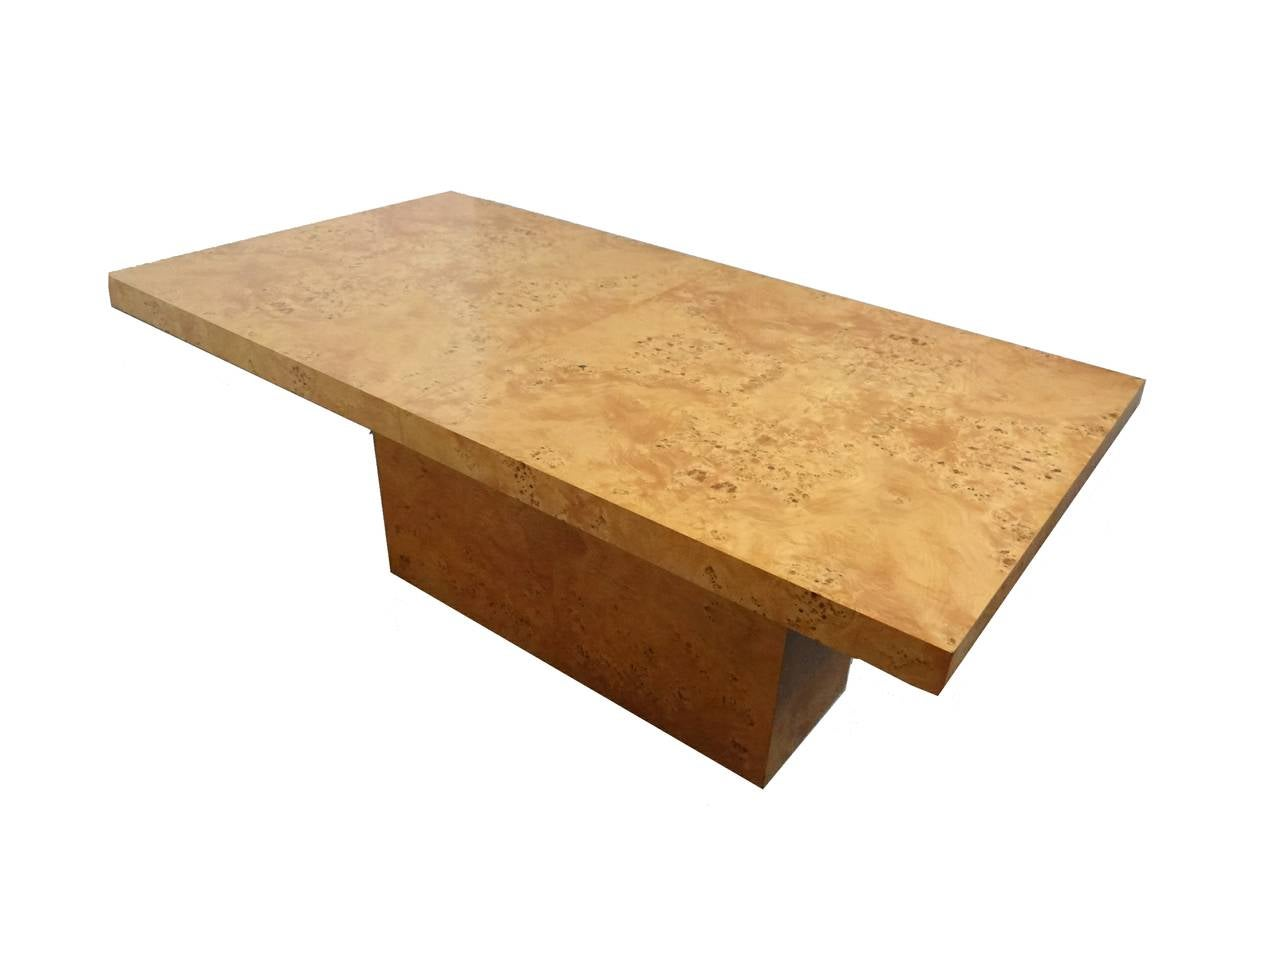 Milo baughman bird s eye maple burl wood dining table by